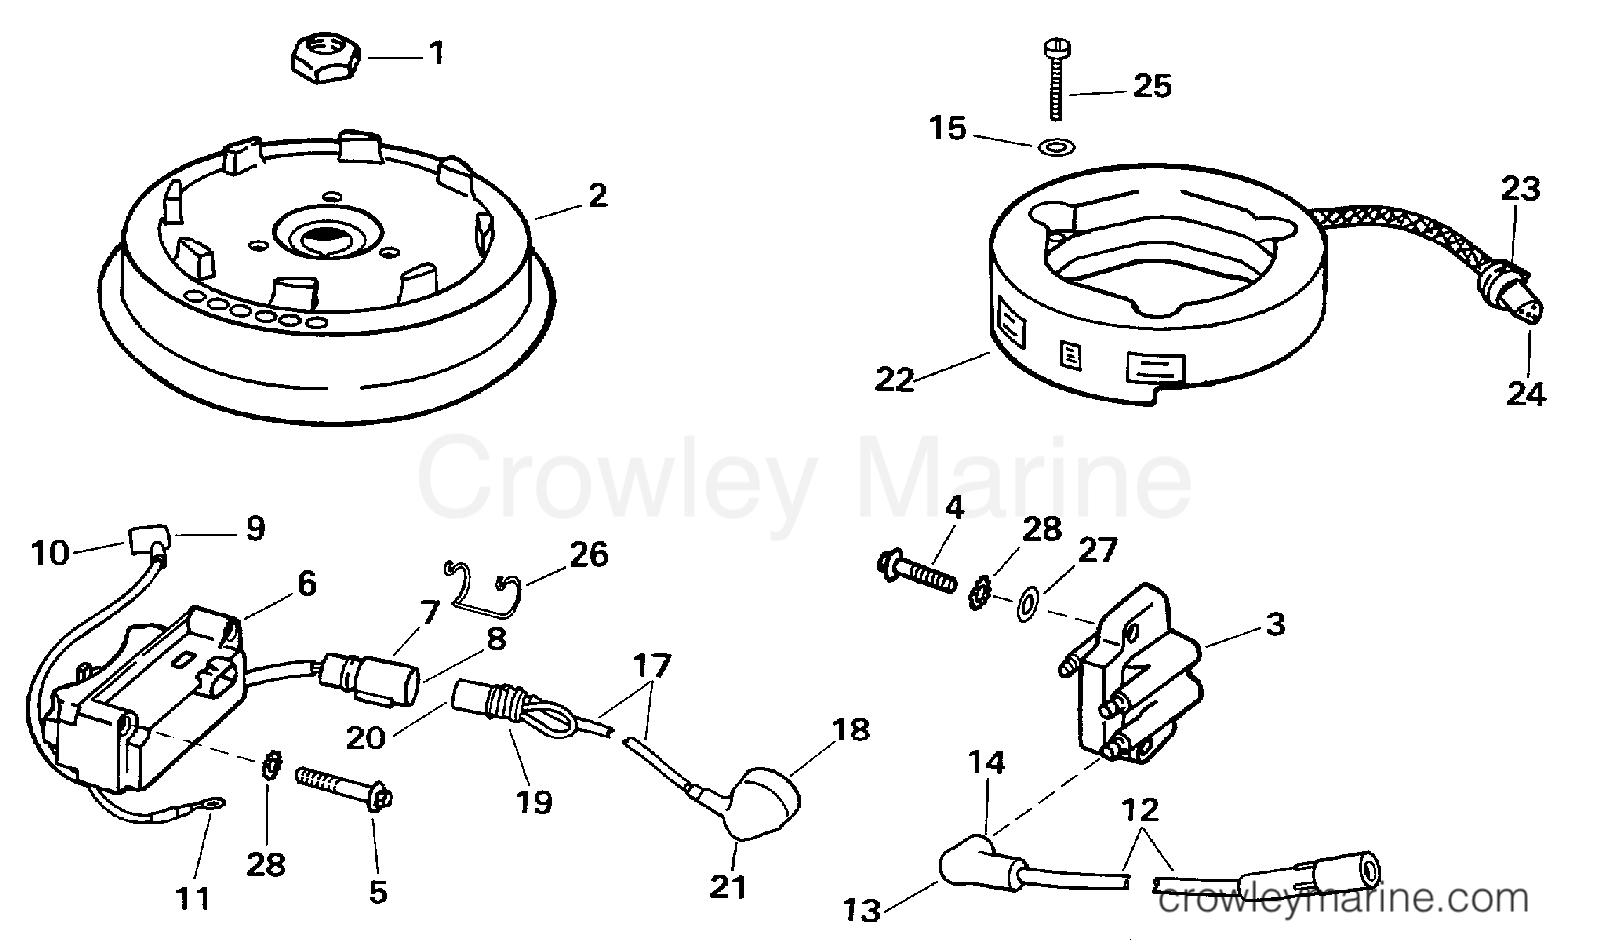 Chevy K5 Blazer Engine Wiring Diagram - Wiring Diagrams List on